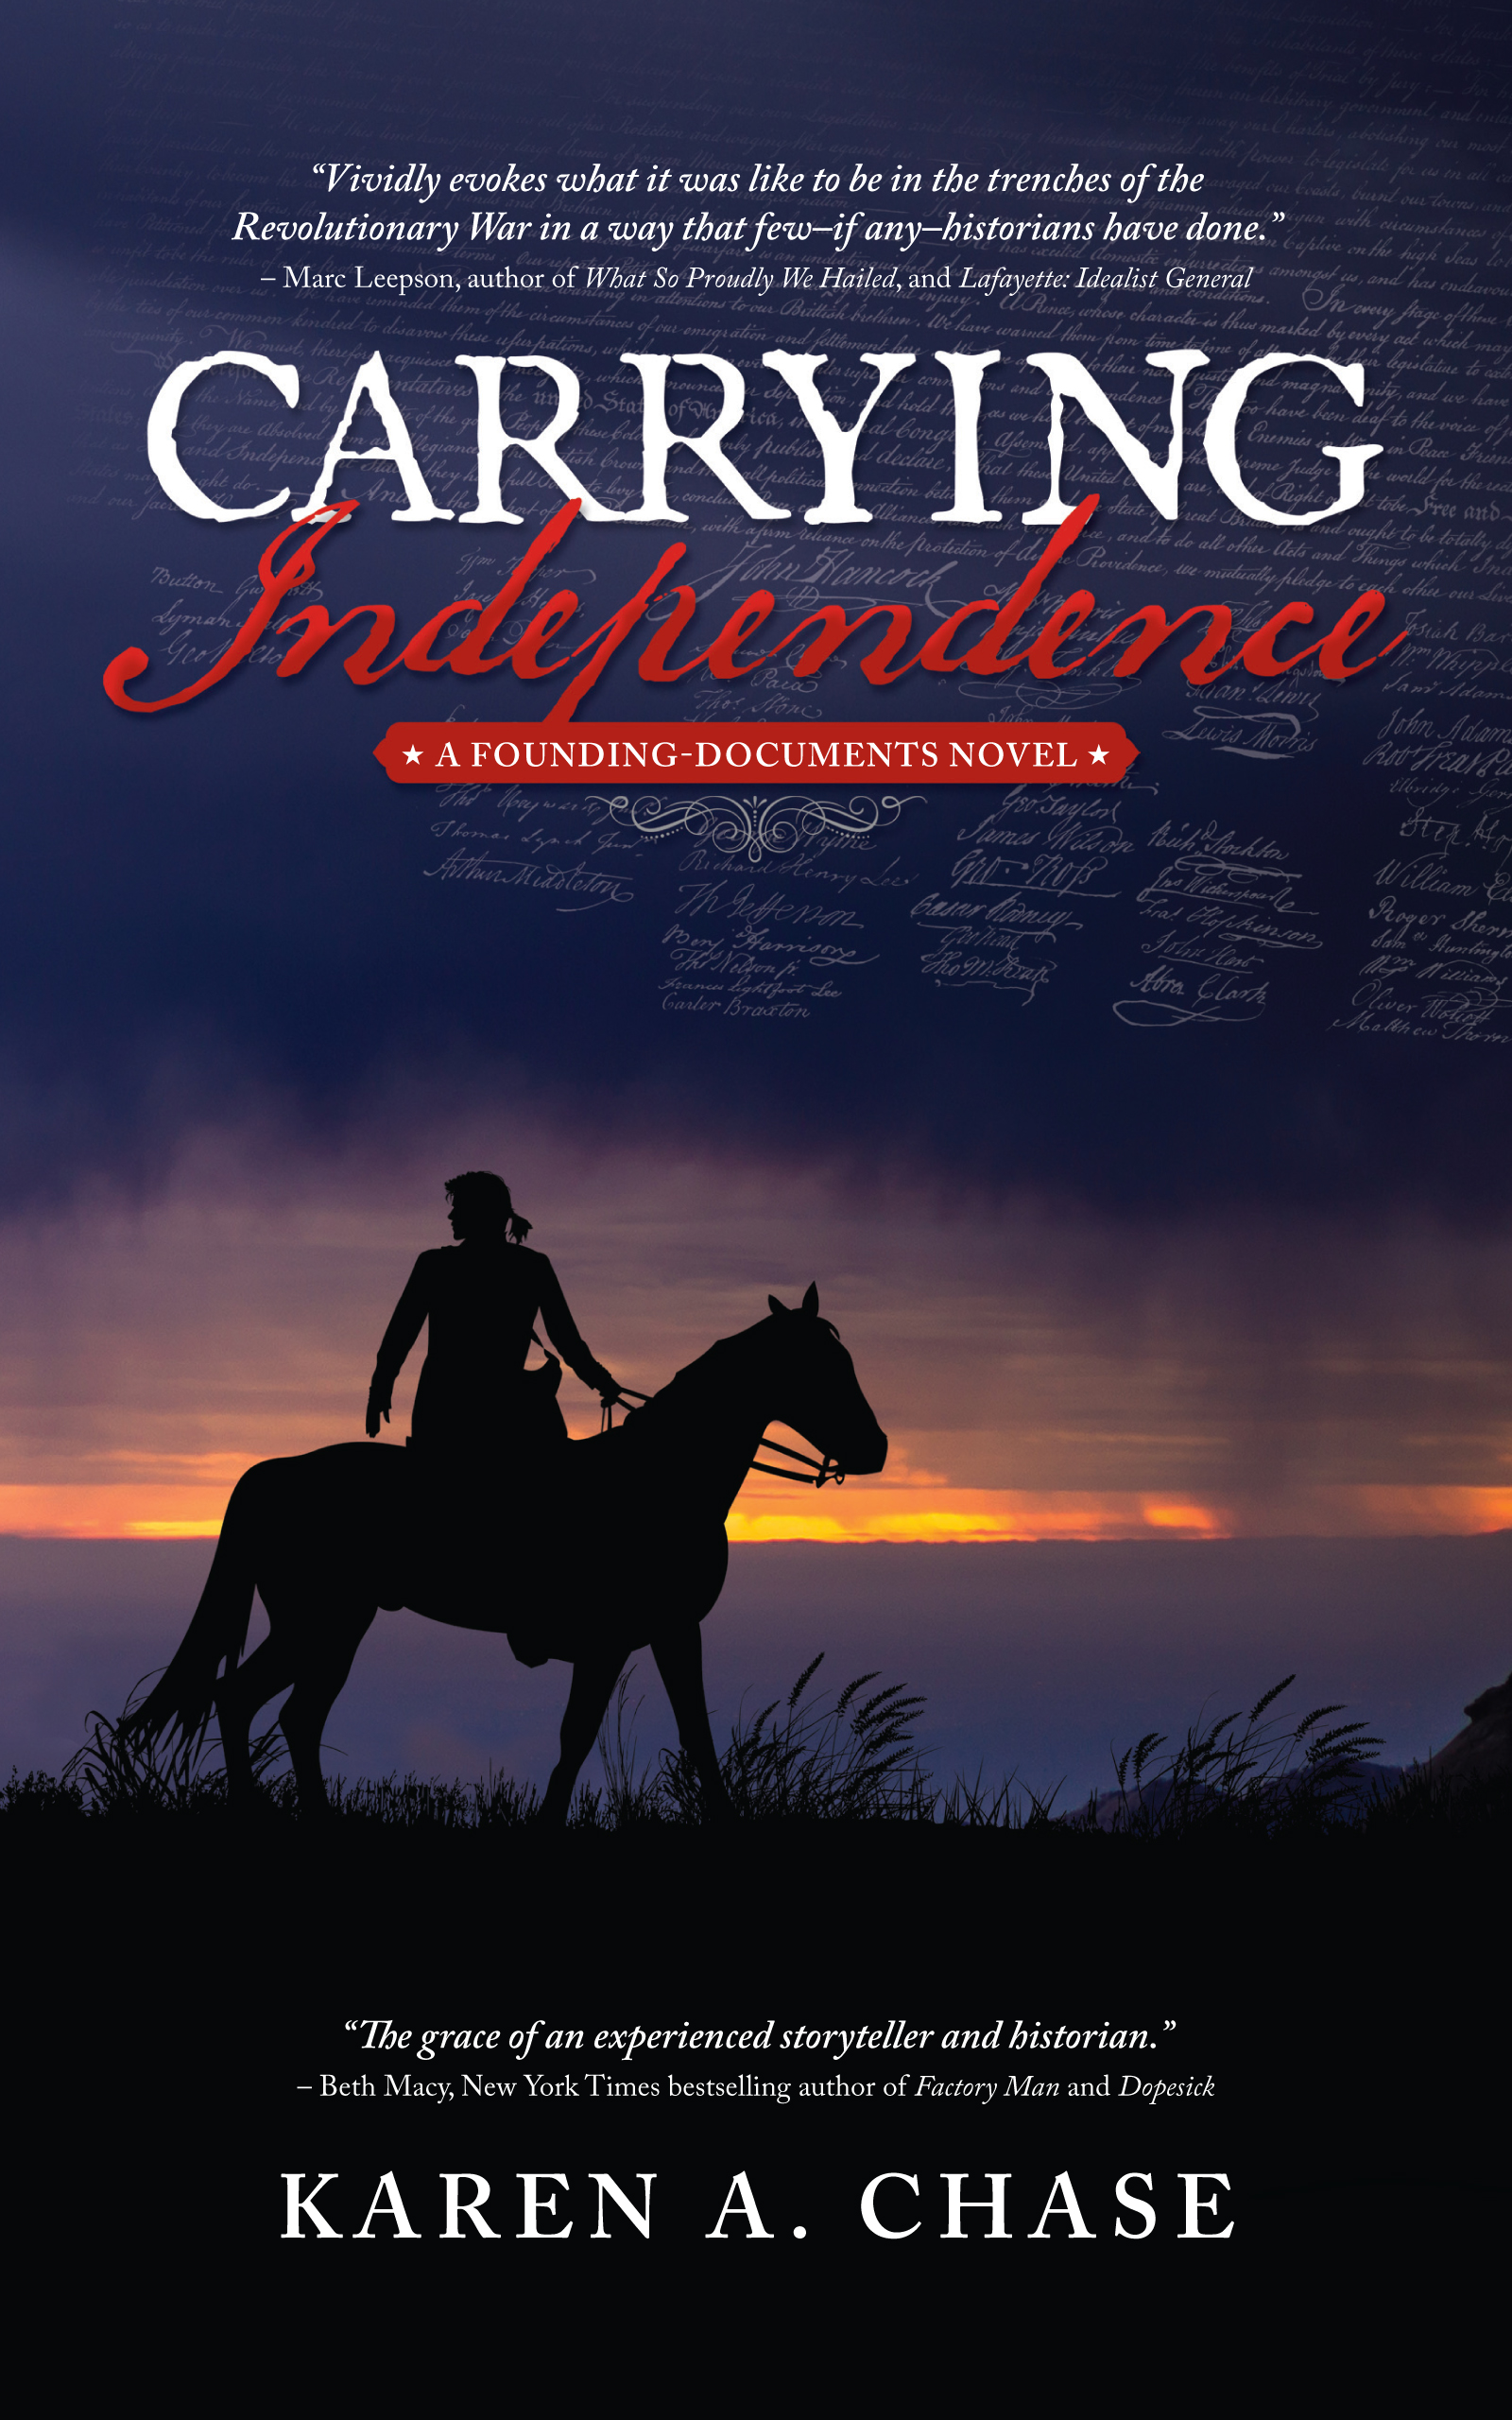 CarryingCoverEbook_April2019.jpg